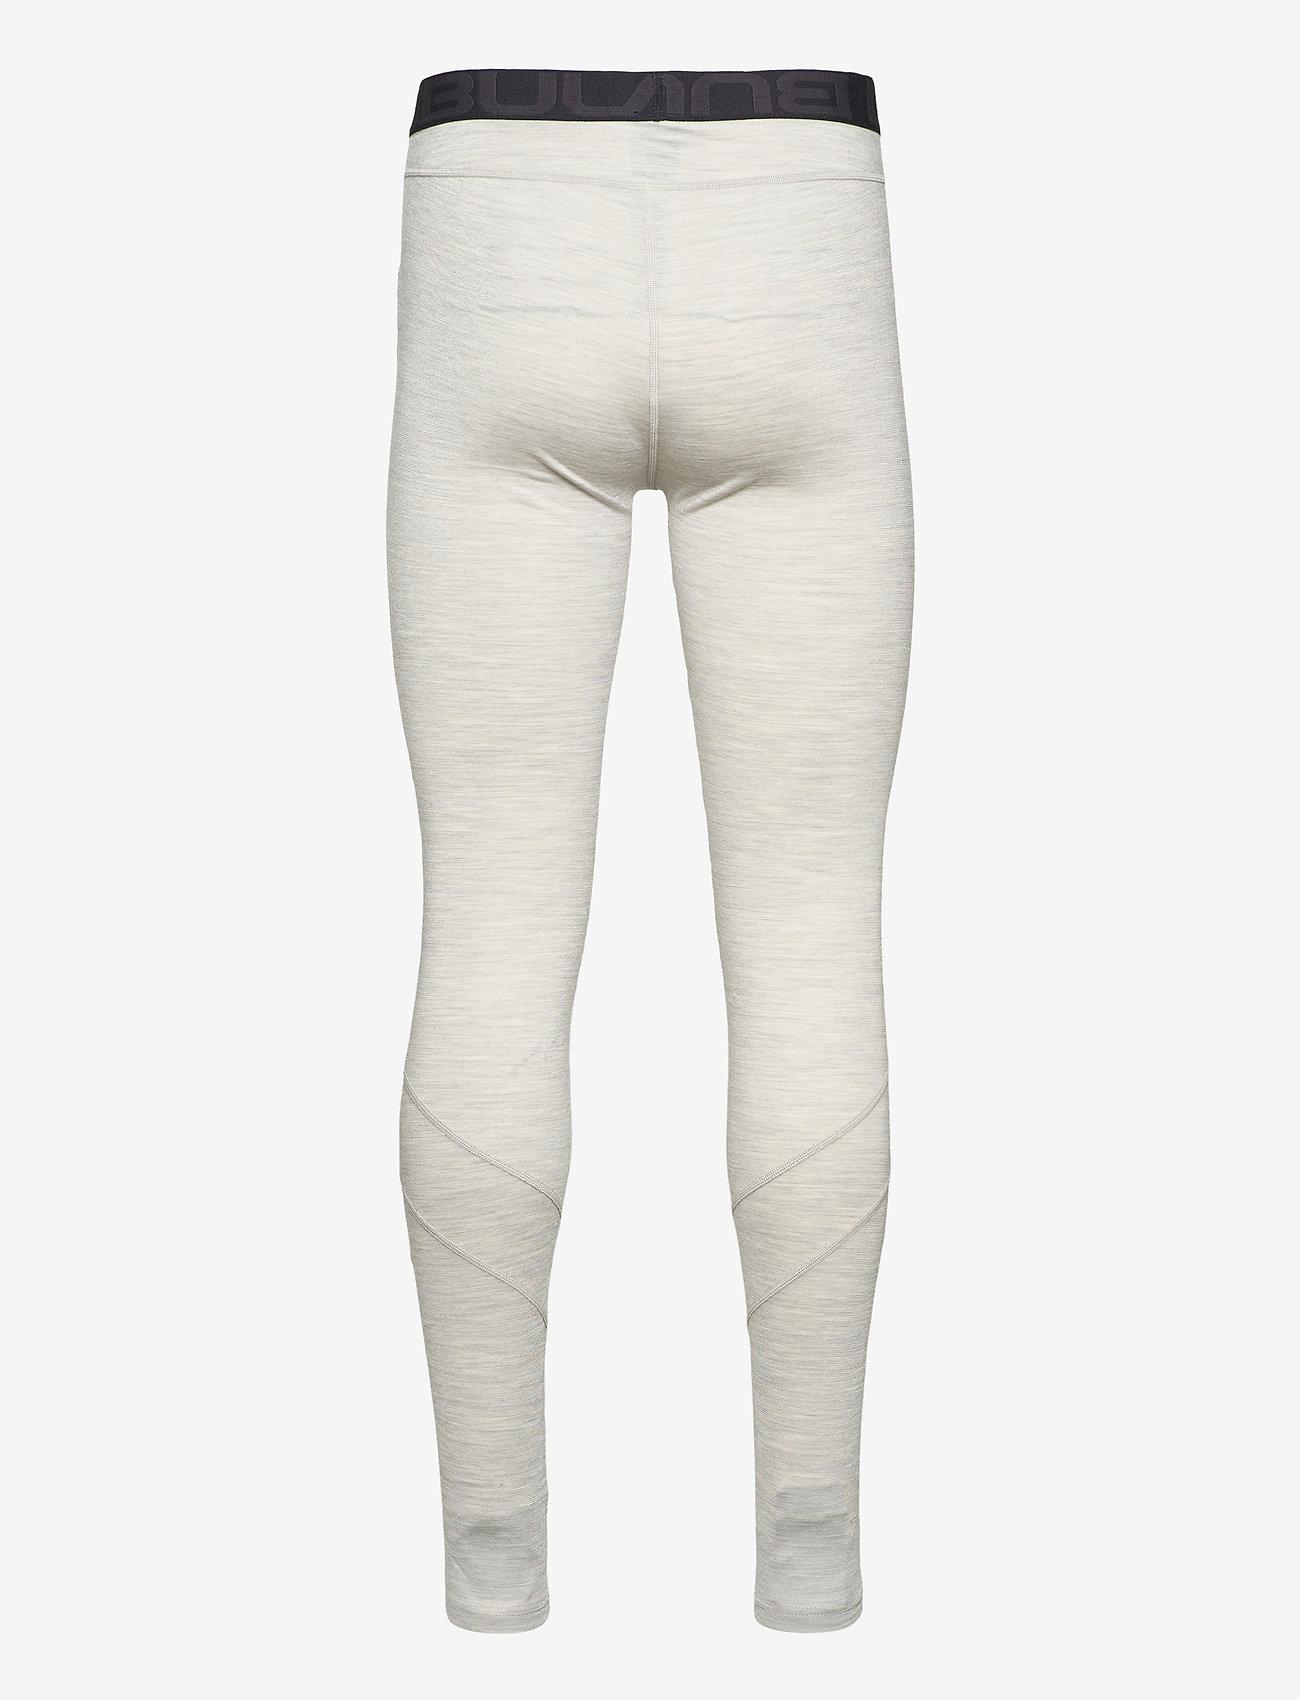 Bula - Retro wool Pants - funkionsunterwäsche - hosen - grey - 1